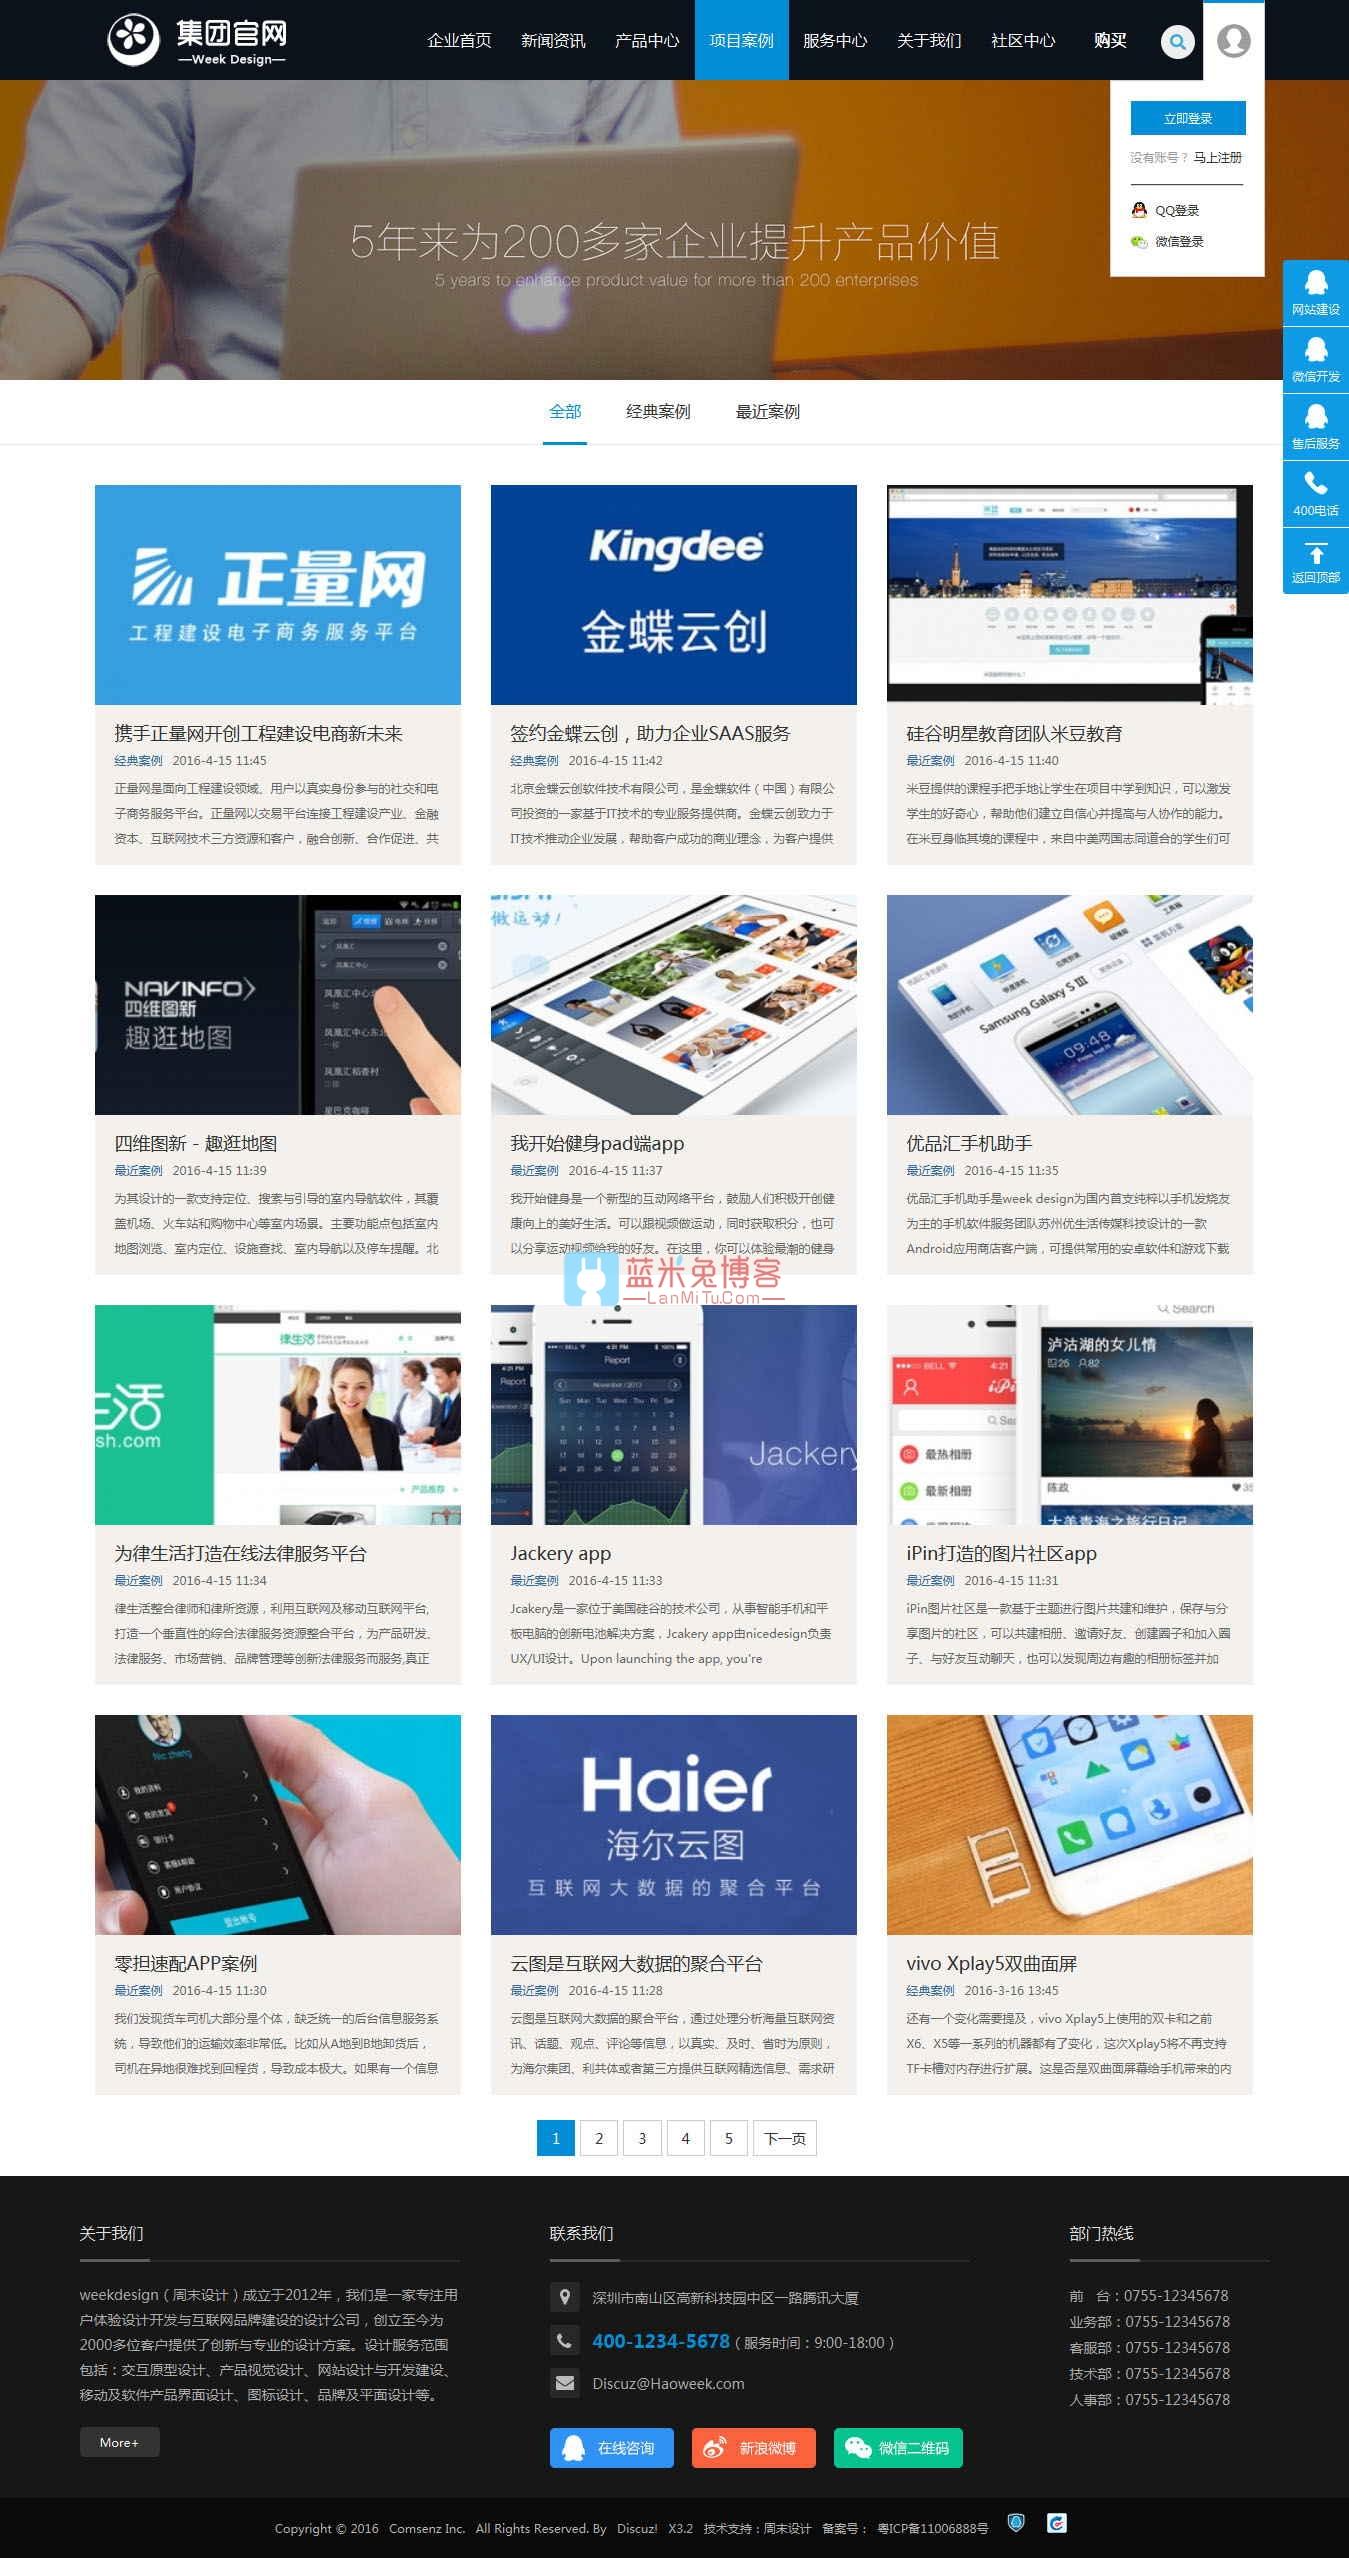 【Discuz 模板】高端企业 集团官网 企业官网模板 商业版 V1.0